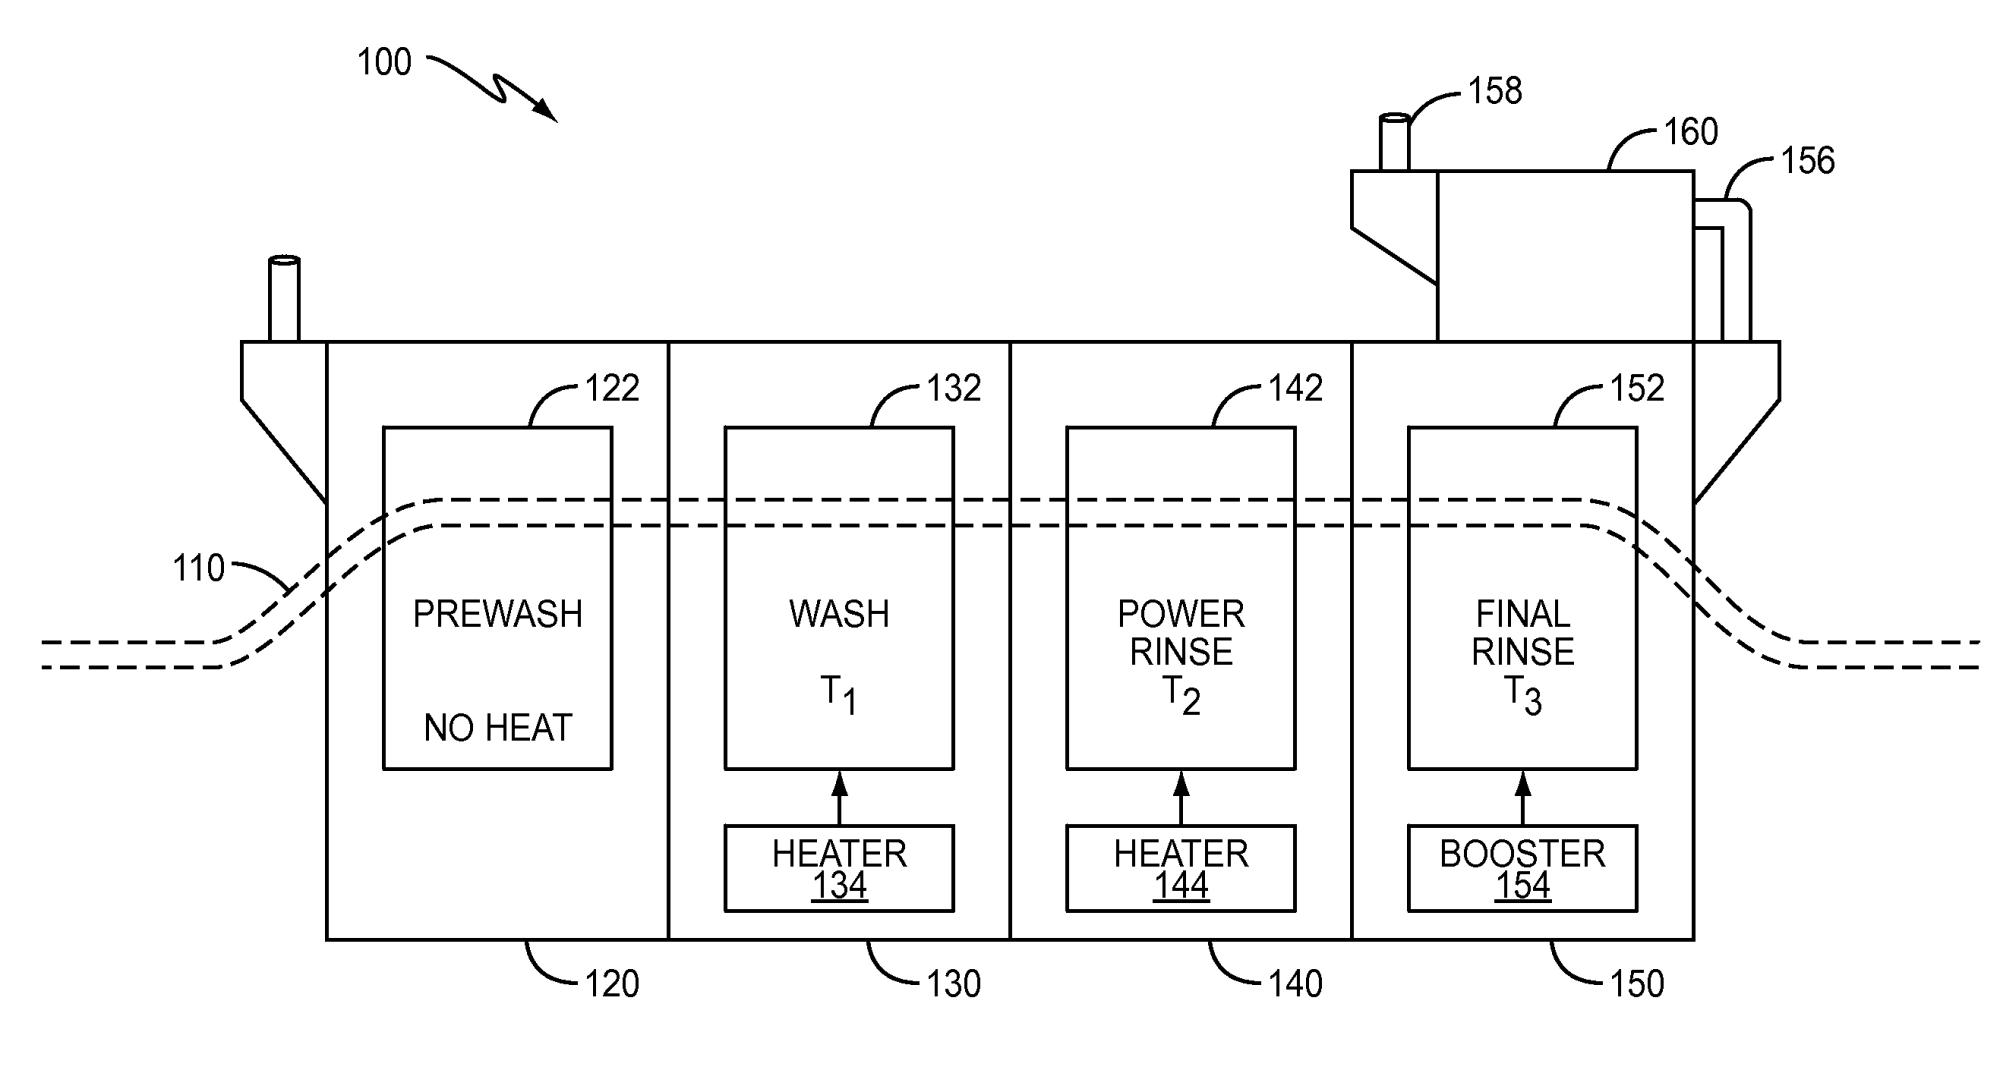 hight resolution of miele dishwasher wiring diagram samsung dishwasher wiring hobart am 14 wiring diagram hobart am 14 wiring